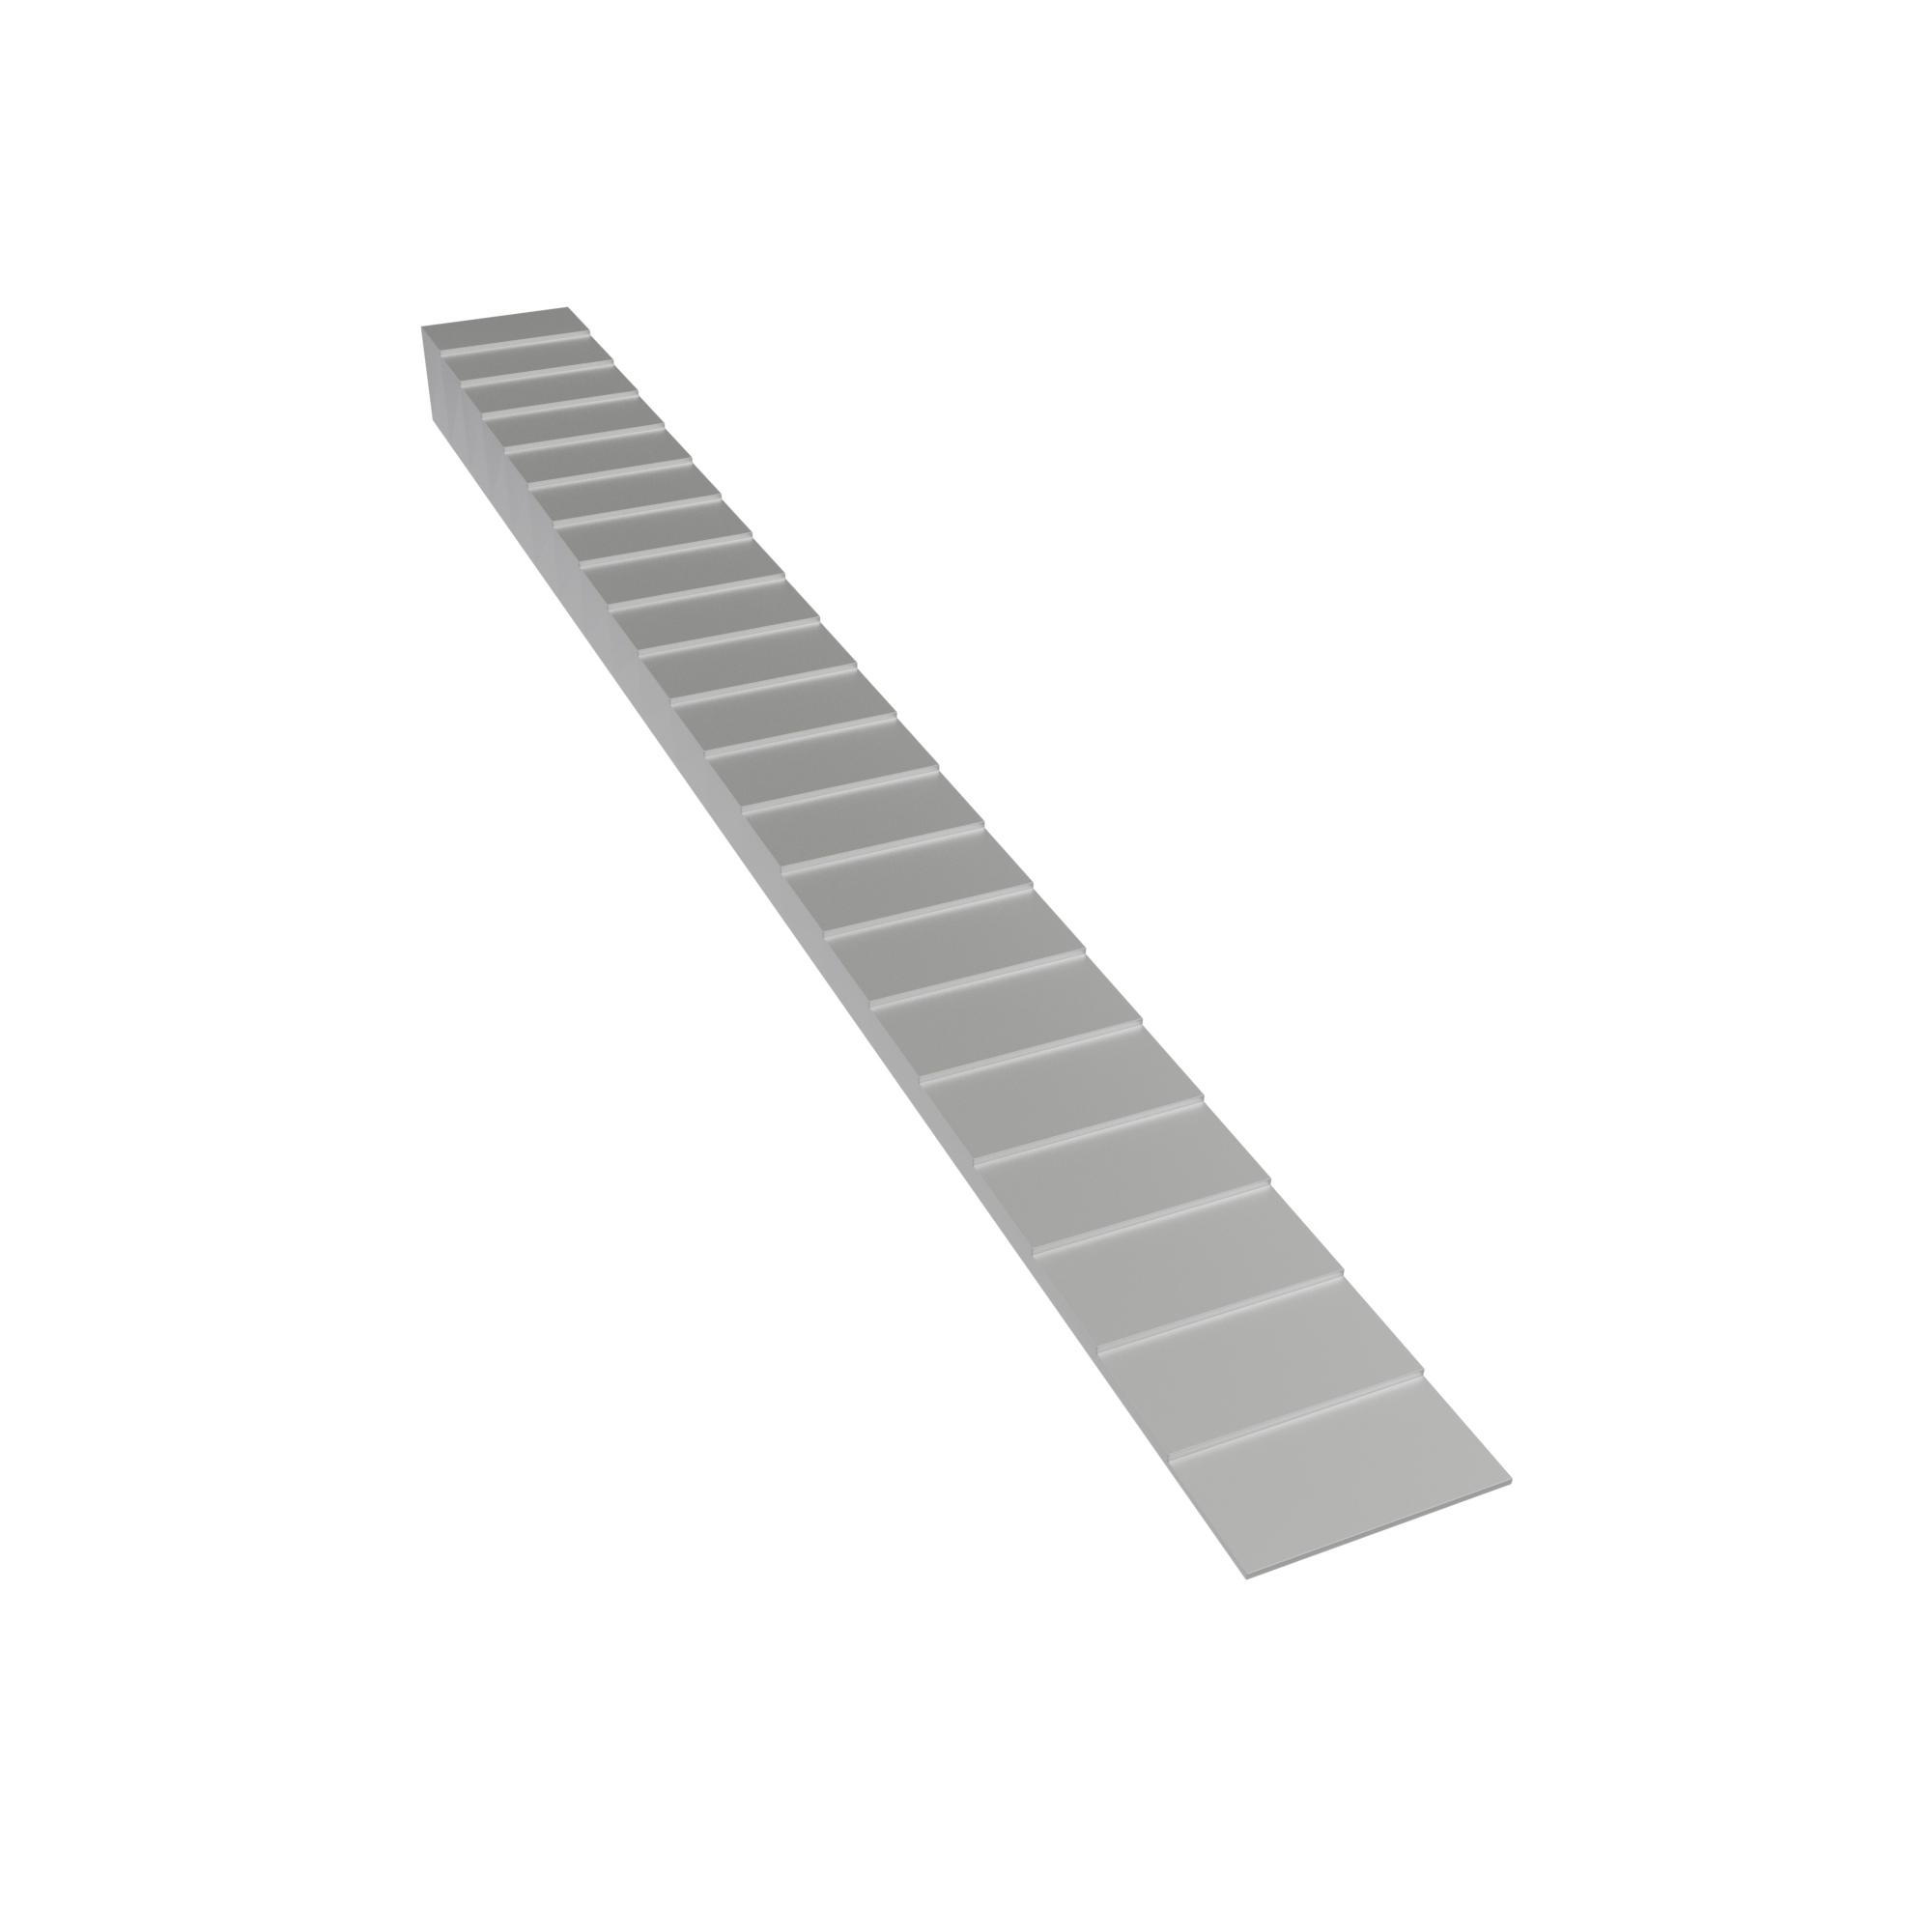 Pro-MAM 21 Steps